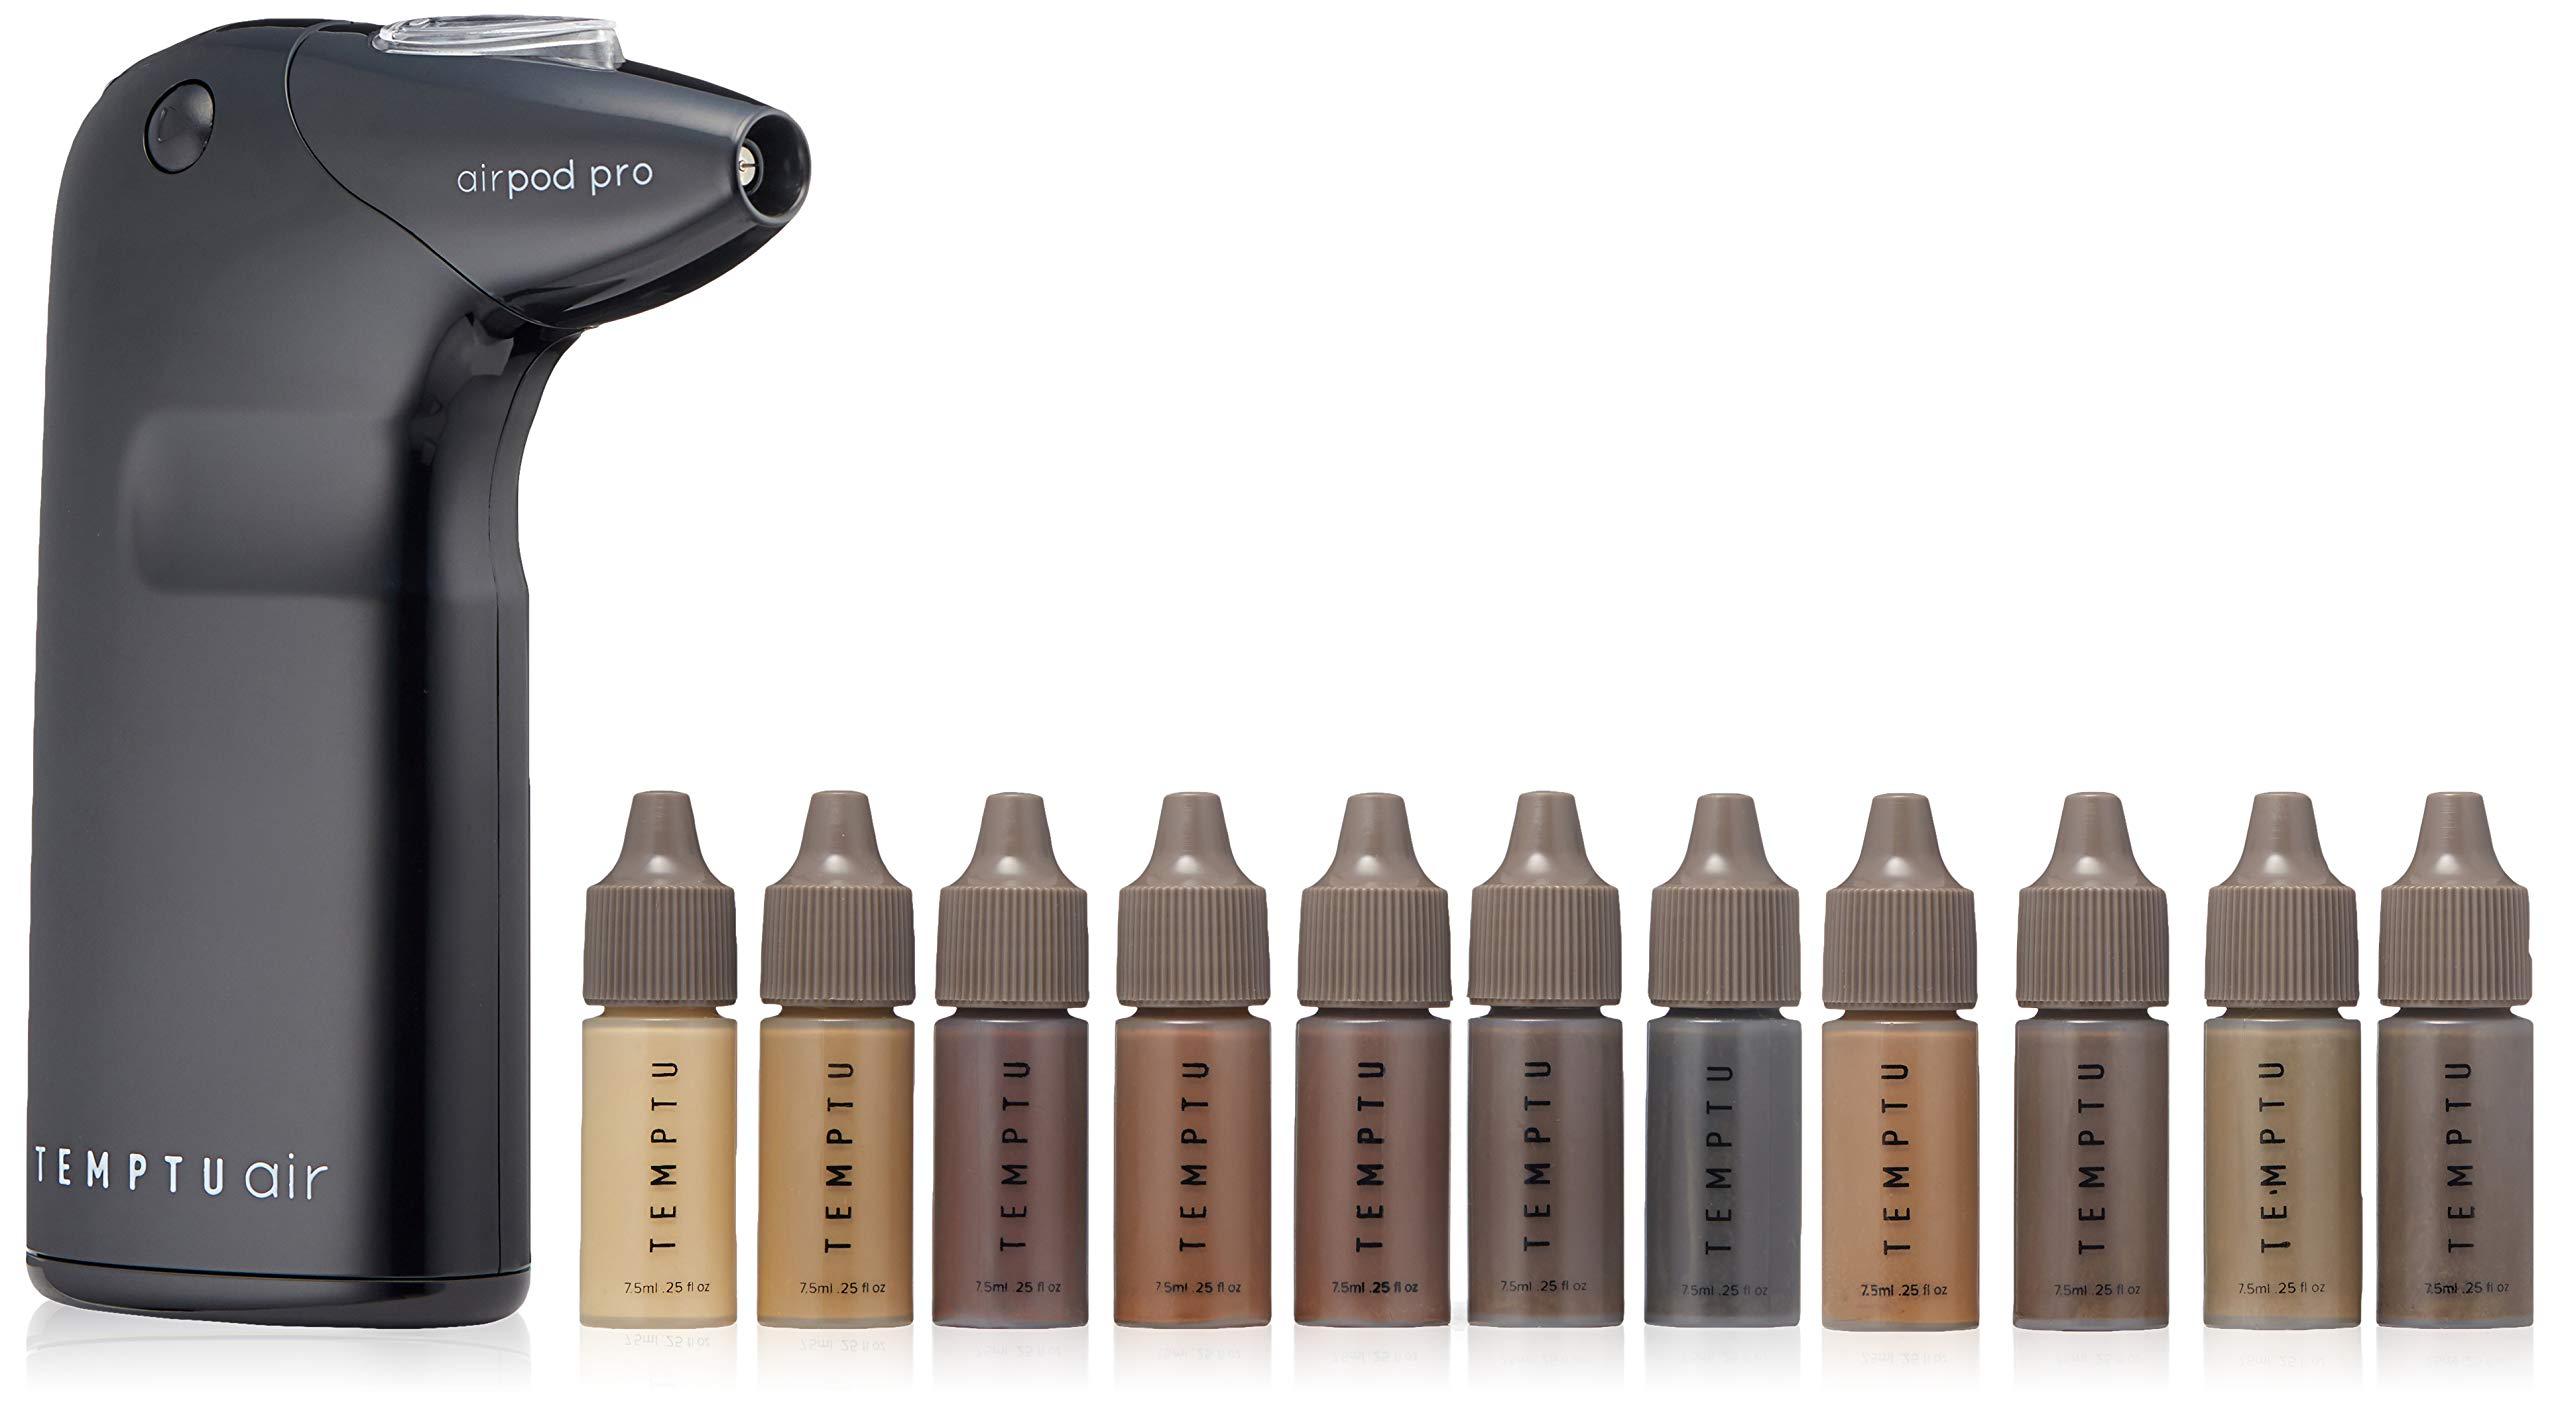 Temptu Air Barber Pro Deluxe Kit, Uburn, Light Brown, Medium Brown, Dark Brown, Brown/Black, Platinum Blonde, Golden Blonde by Temptu